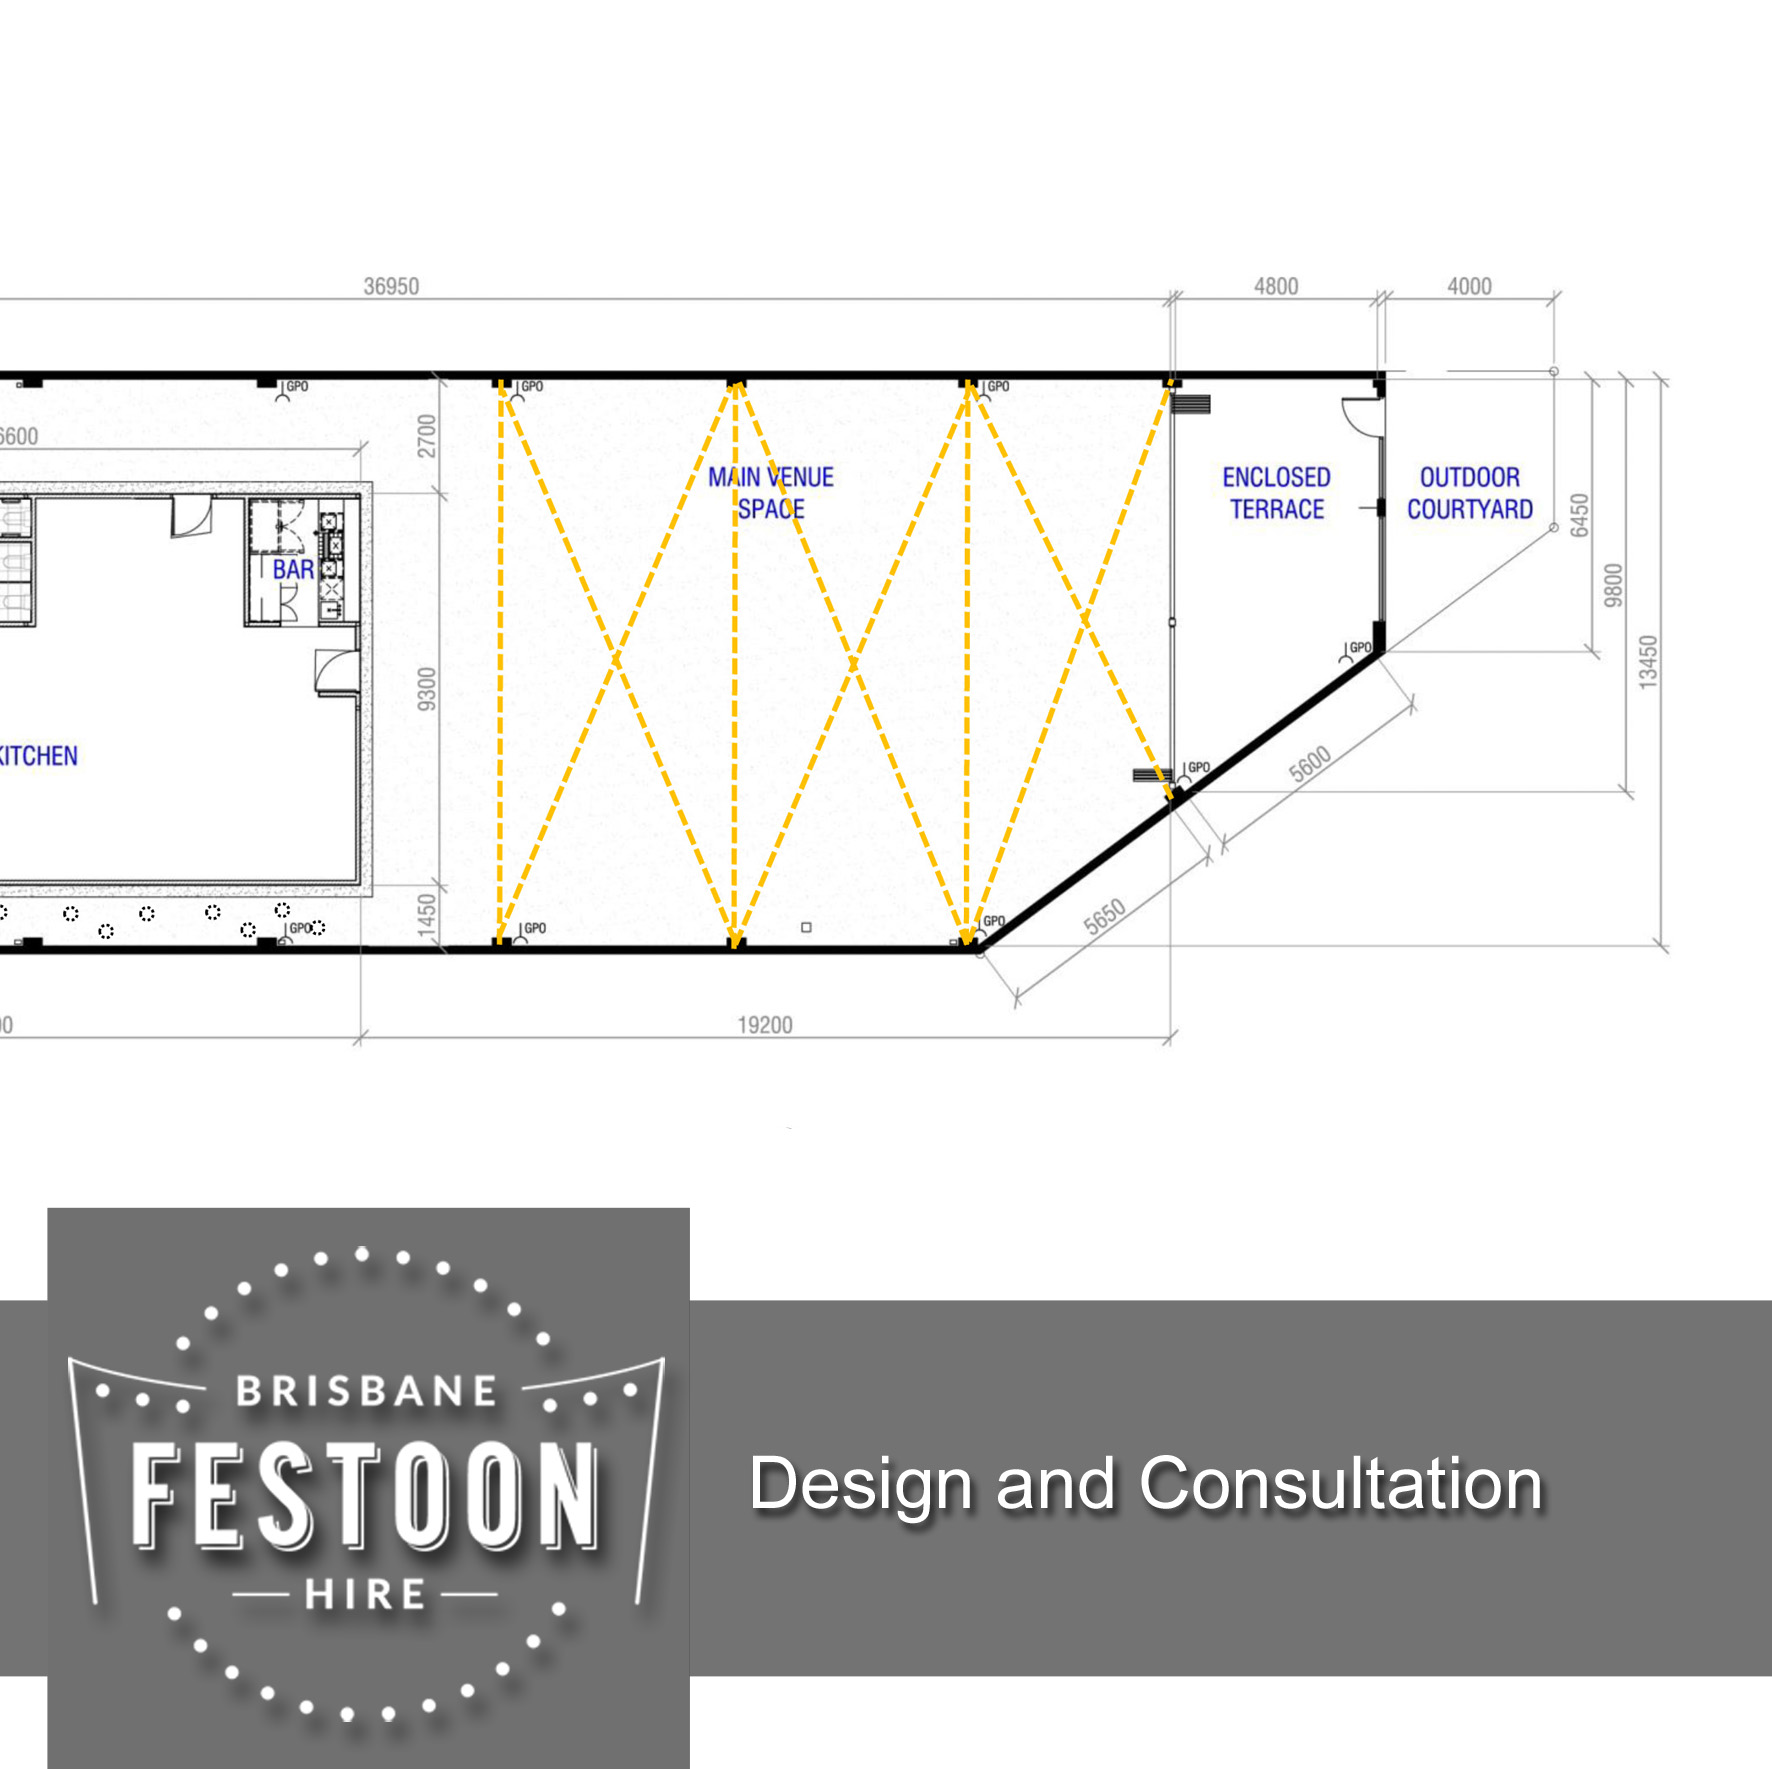 Brisbane Festoon Hire - Design and Consultation BLK 2.jpg